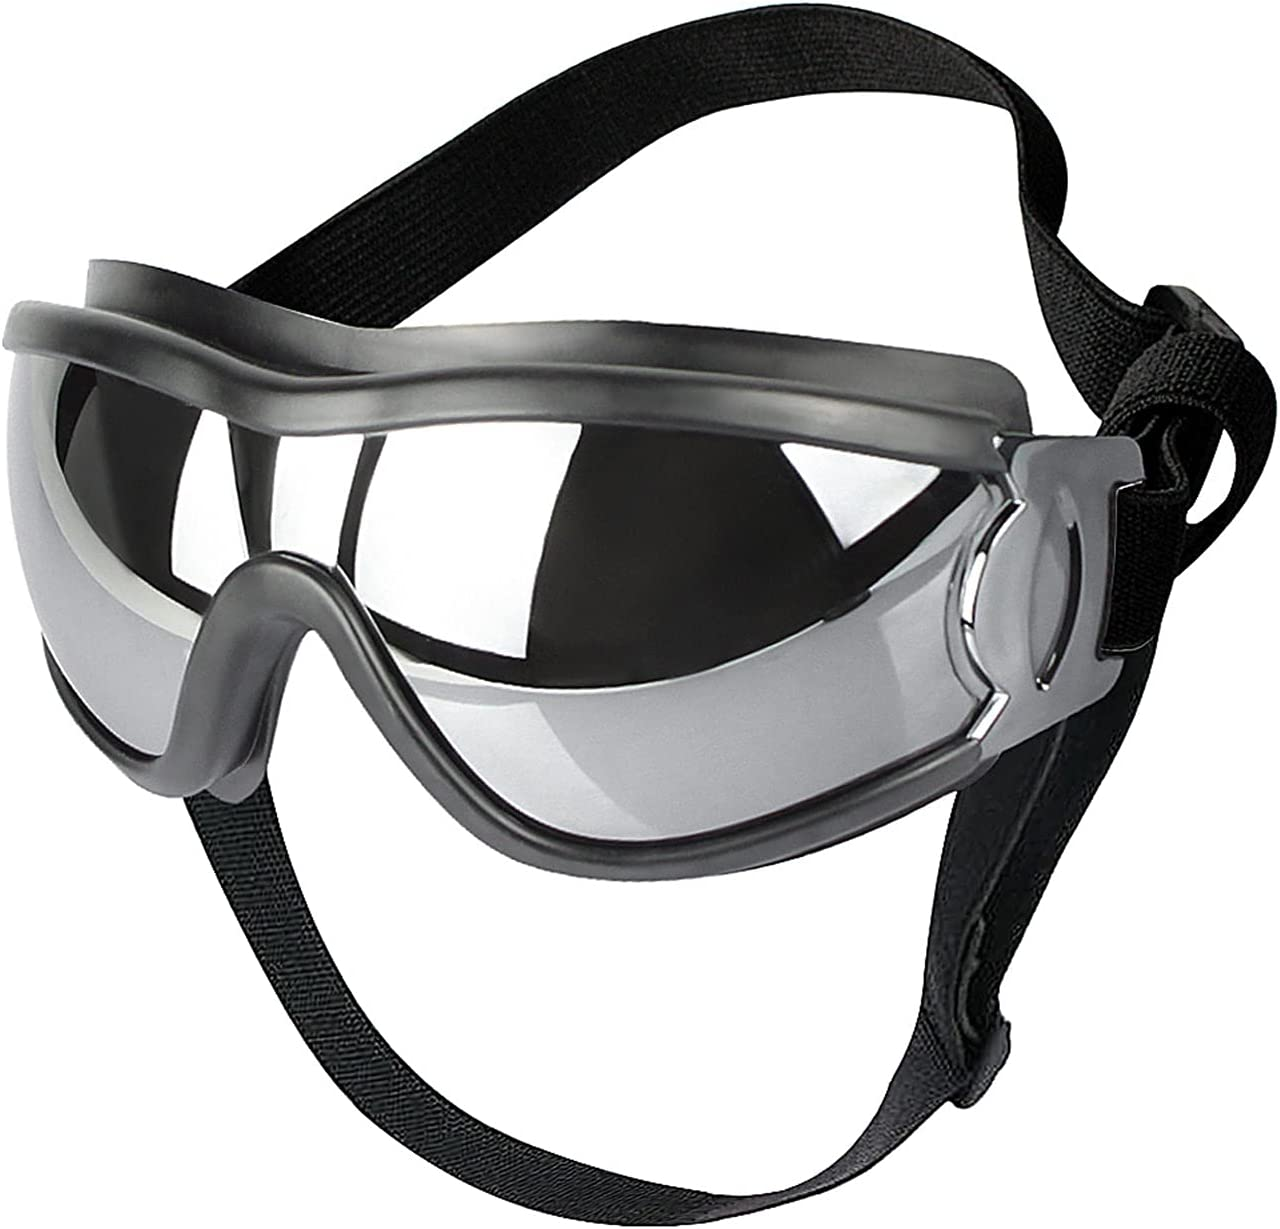 Dog Goggles Medium or Large Anti-UV Ranking TOP6 Indianapolis Mall Waterproof Sunglasses Wi